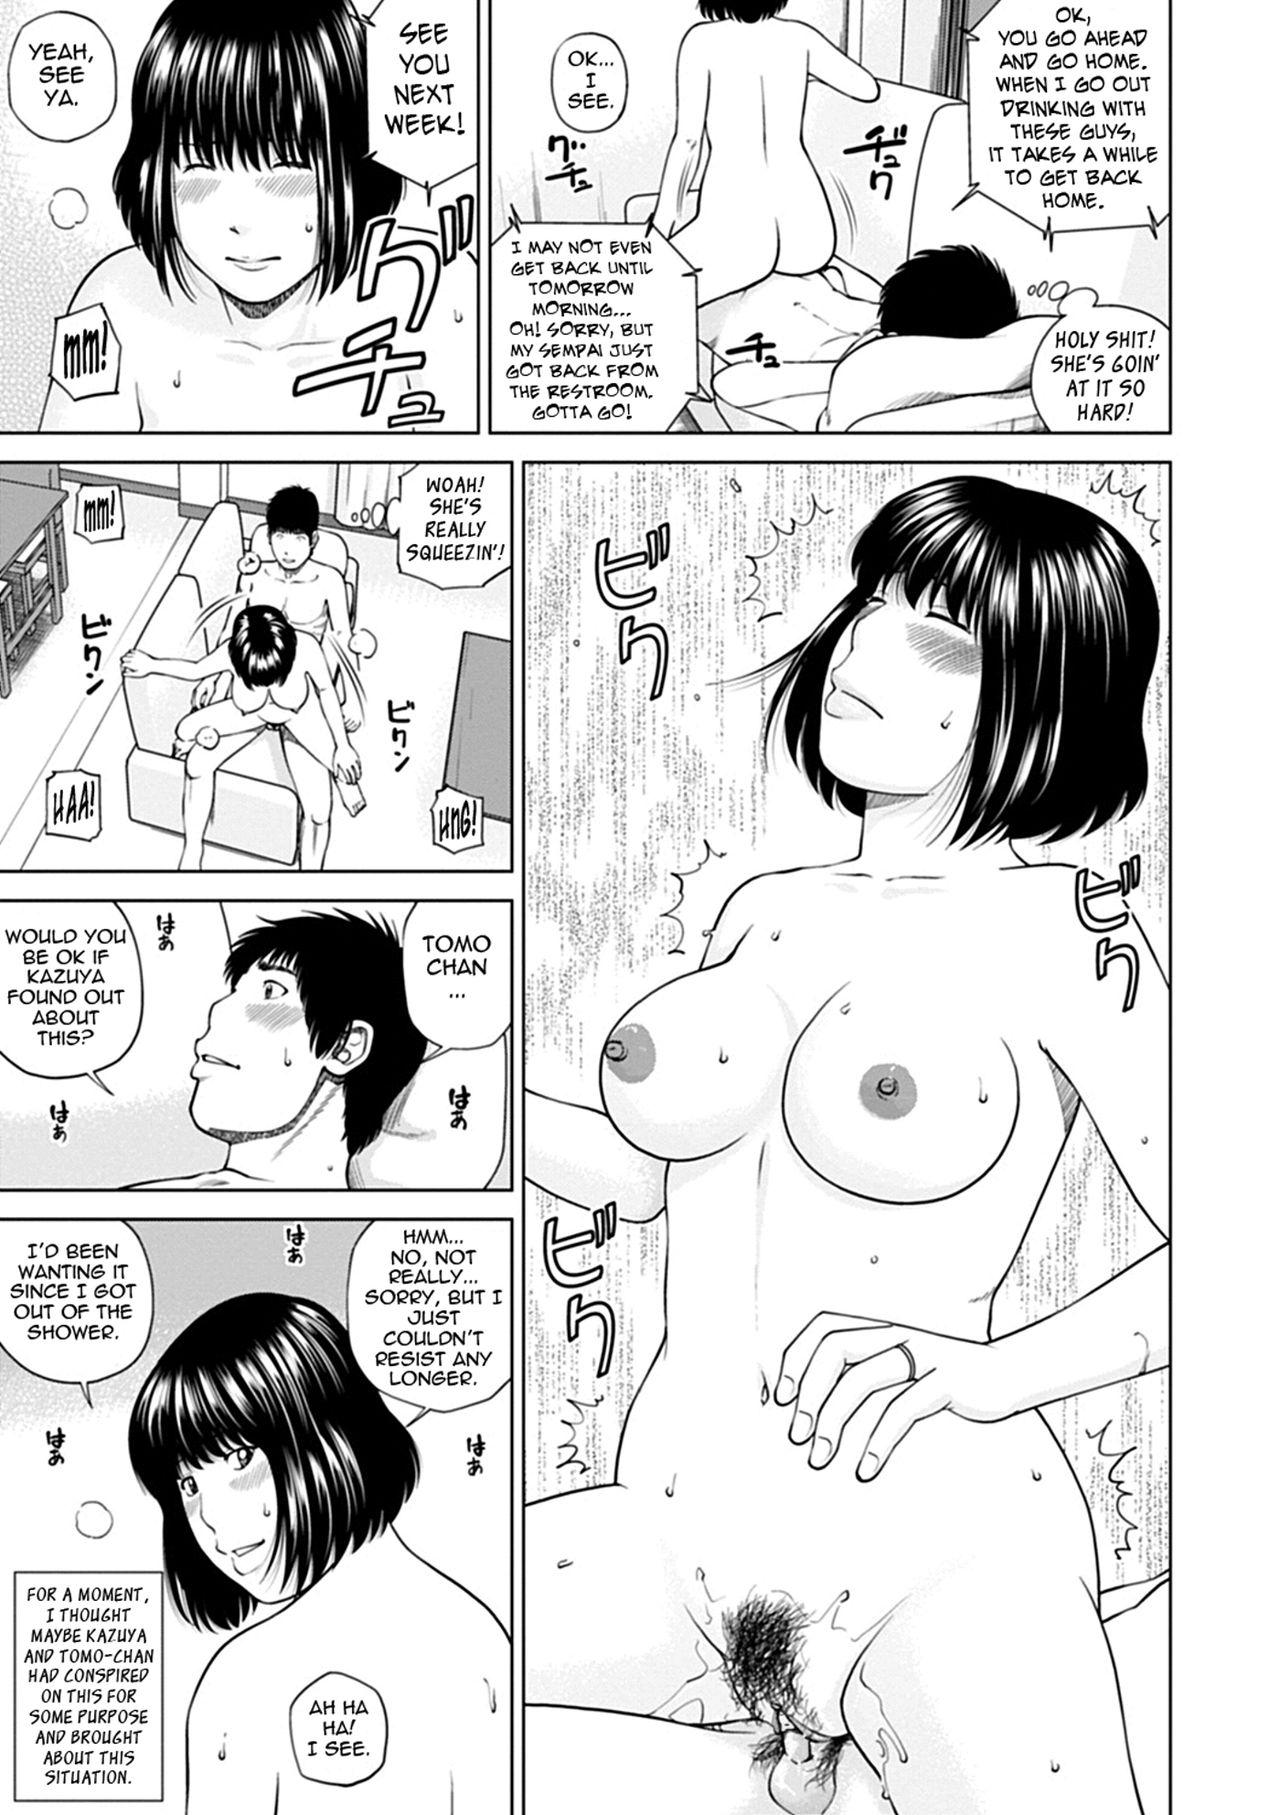 [Kuroki Hidehiko] 36-sai Injuku Sakarizuma | 36-Year-Old Randy Mature Wife [English] {Tadanohito} [Digital] [Uncensored] 130